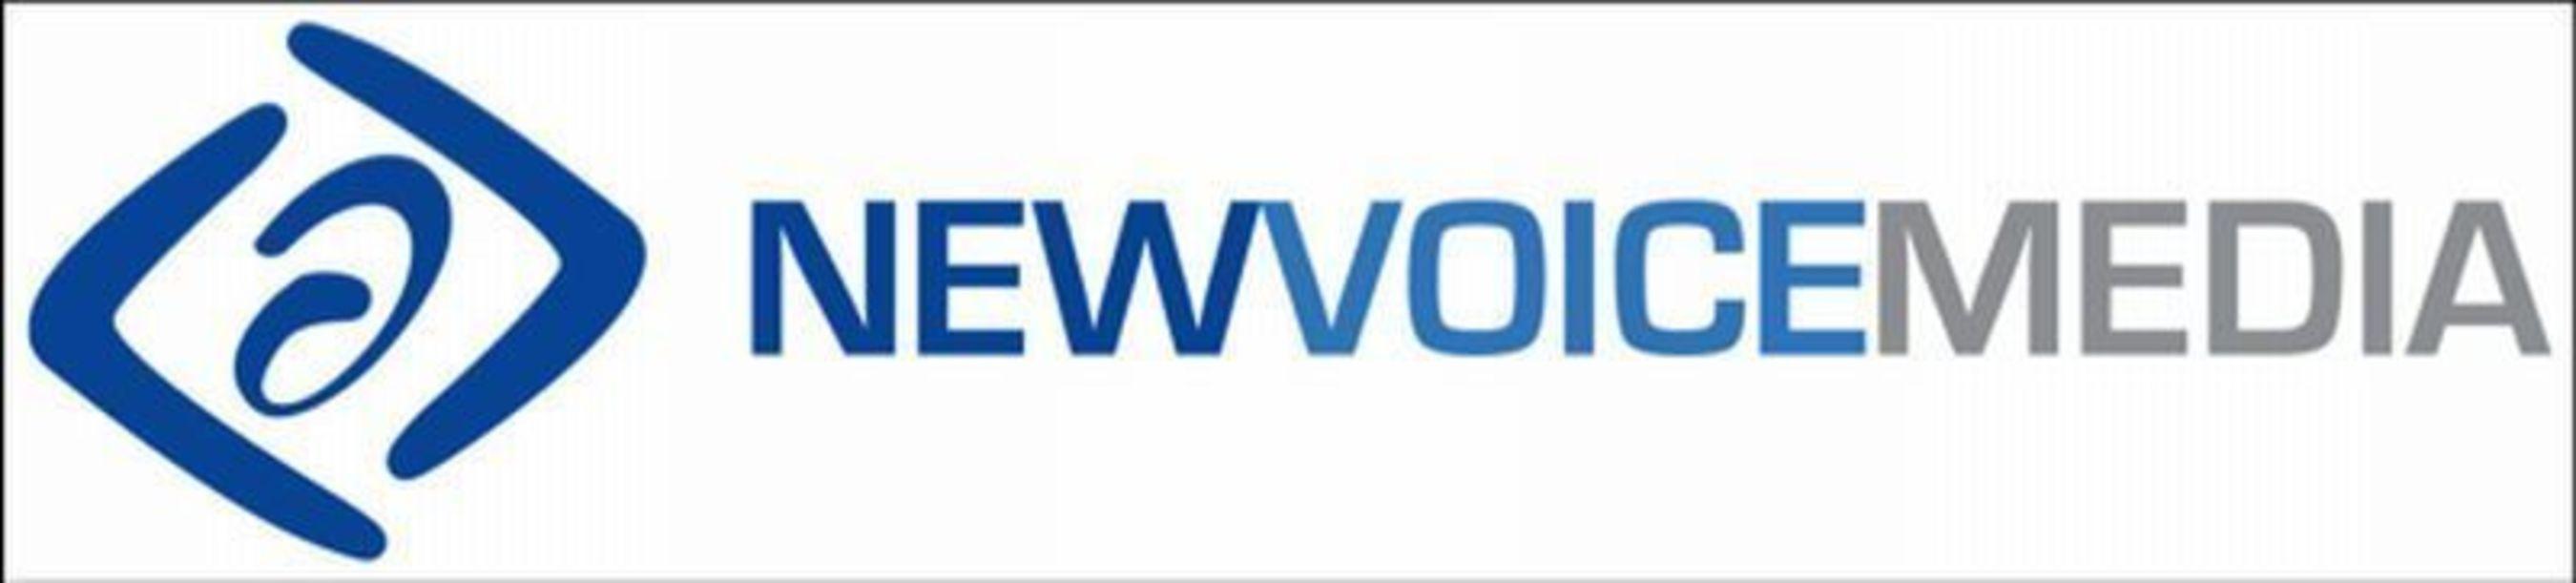 NewVoiceMedia (PRNewsFoto/NewVoiceMedia)